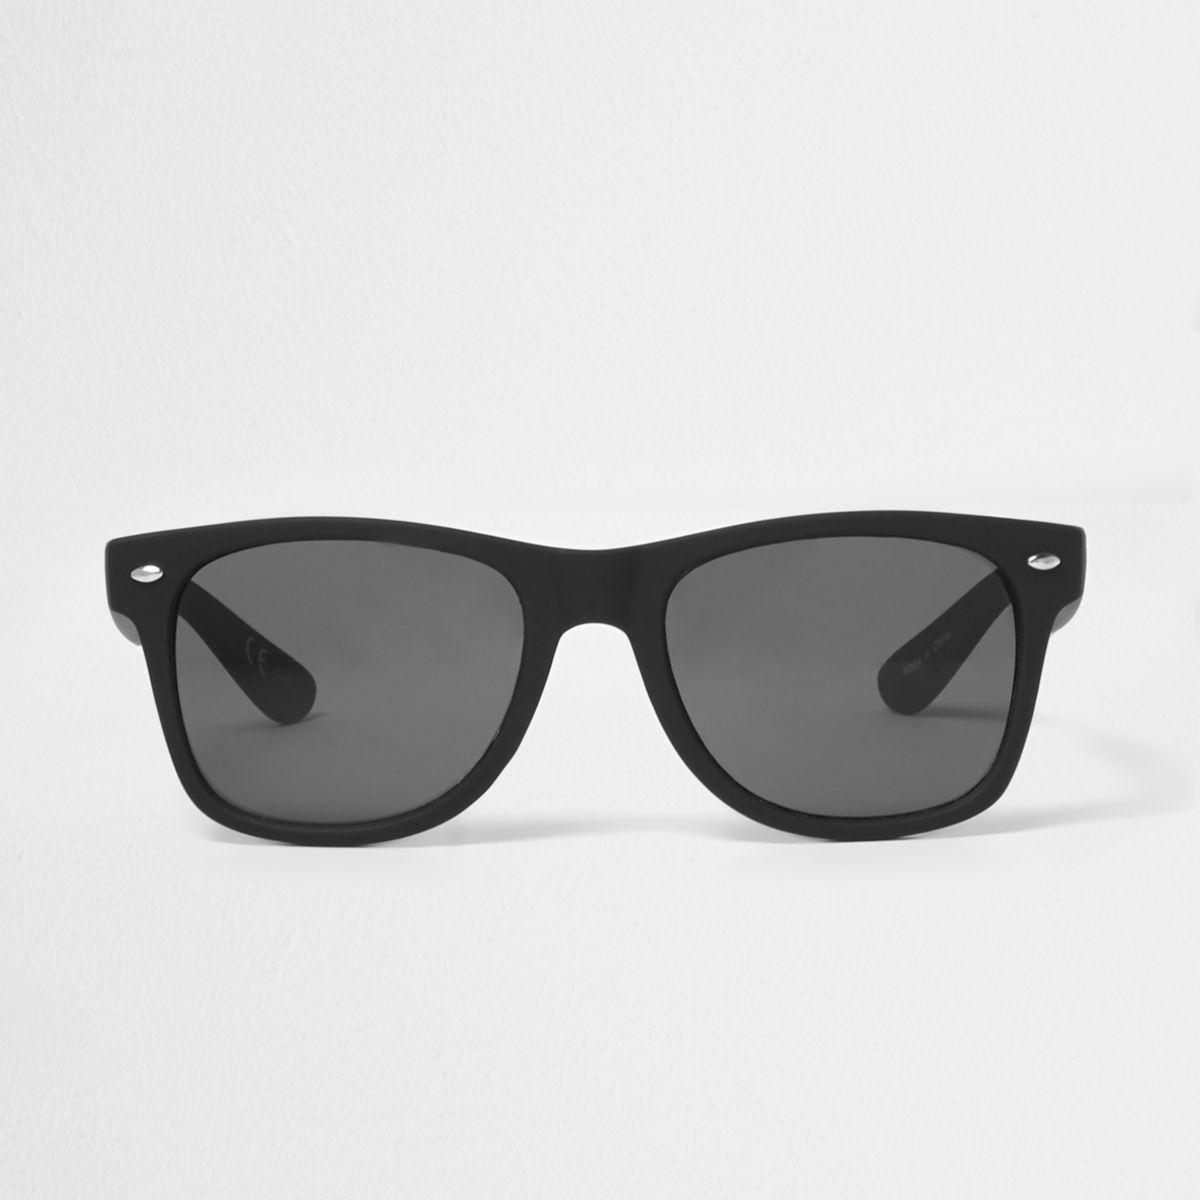 Black retro square sunglasses